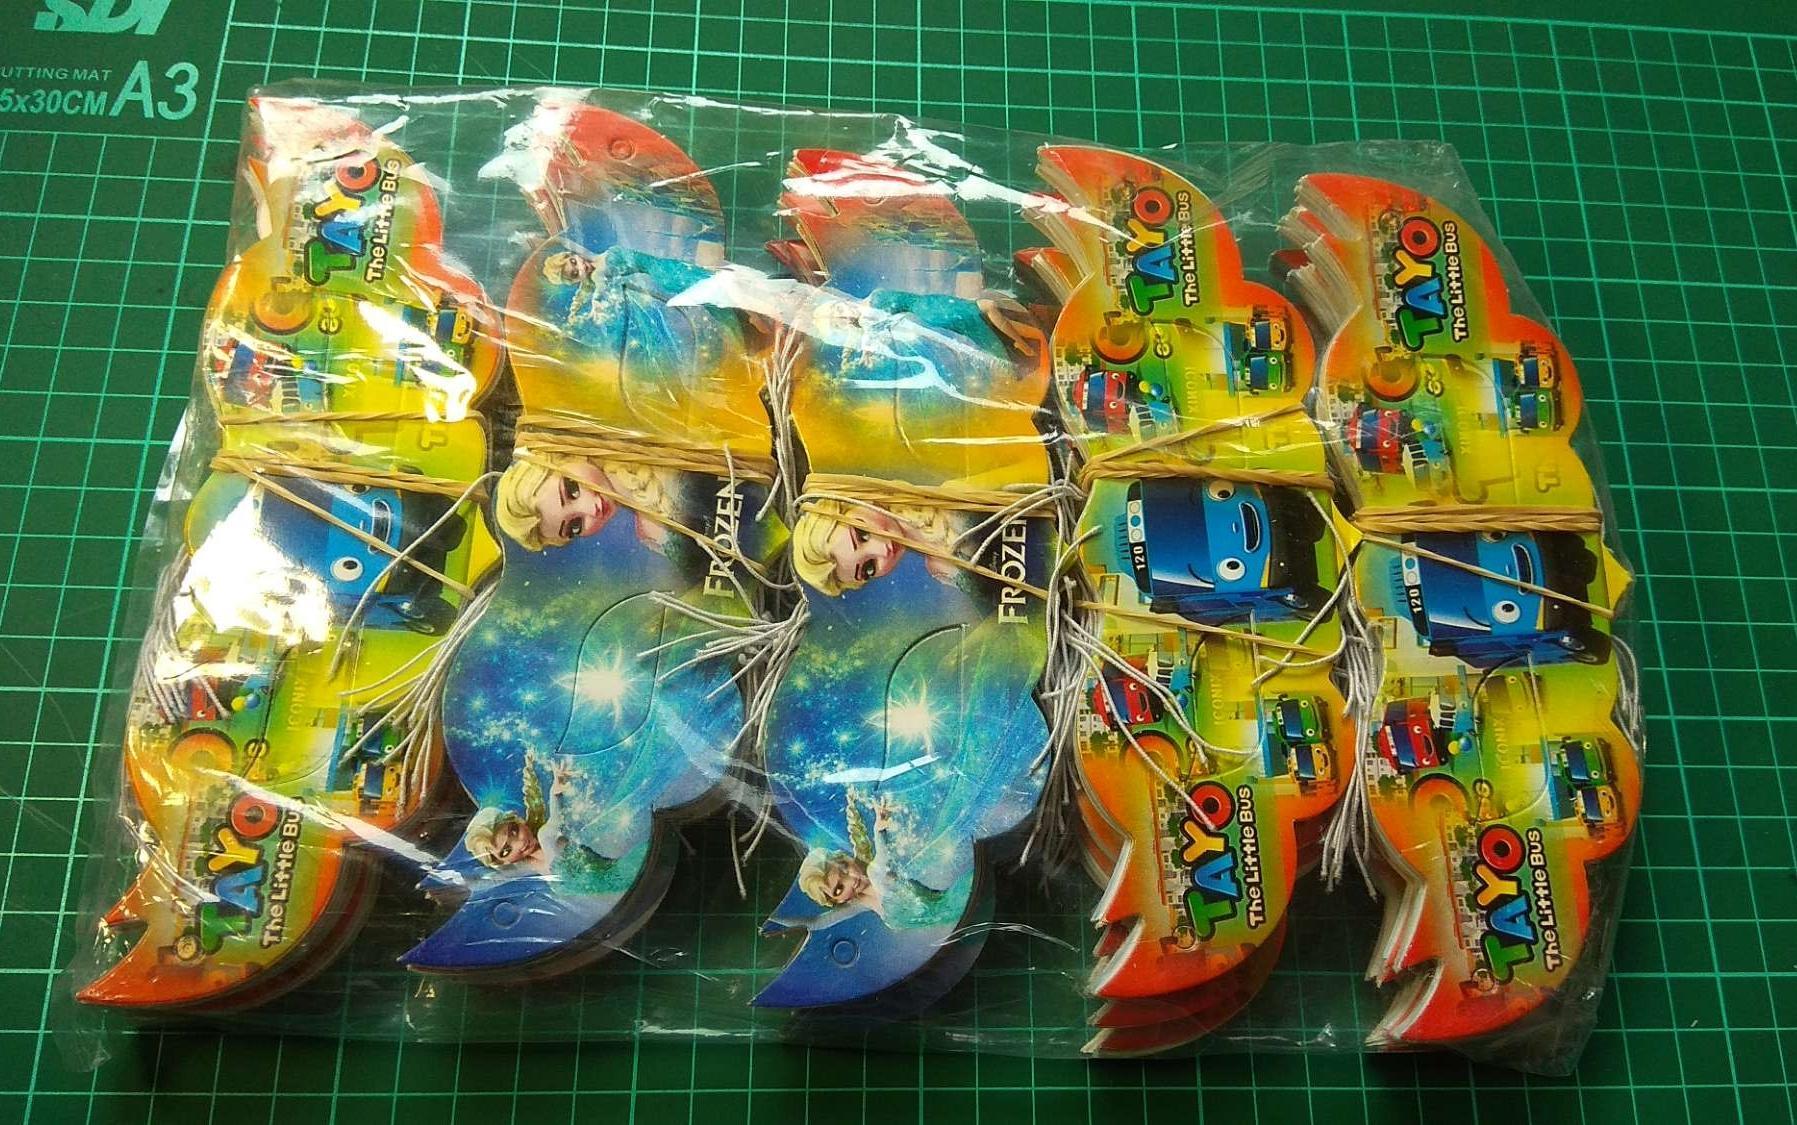 Mainan Kecamatan Mata Kertas Isi 300 Pcs By Difie Toys.